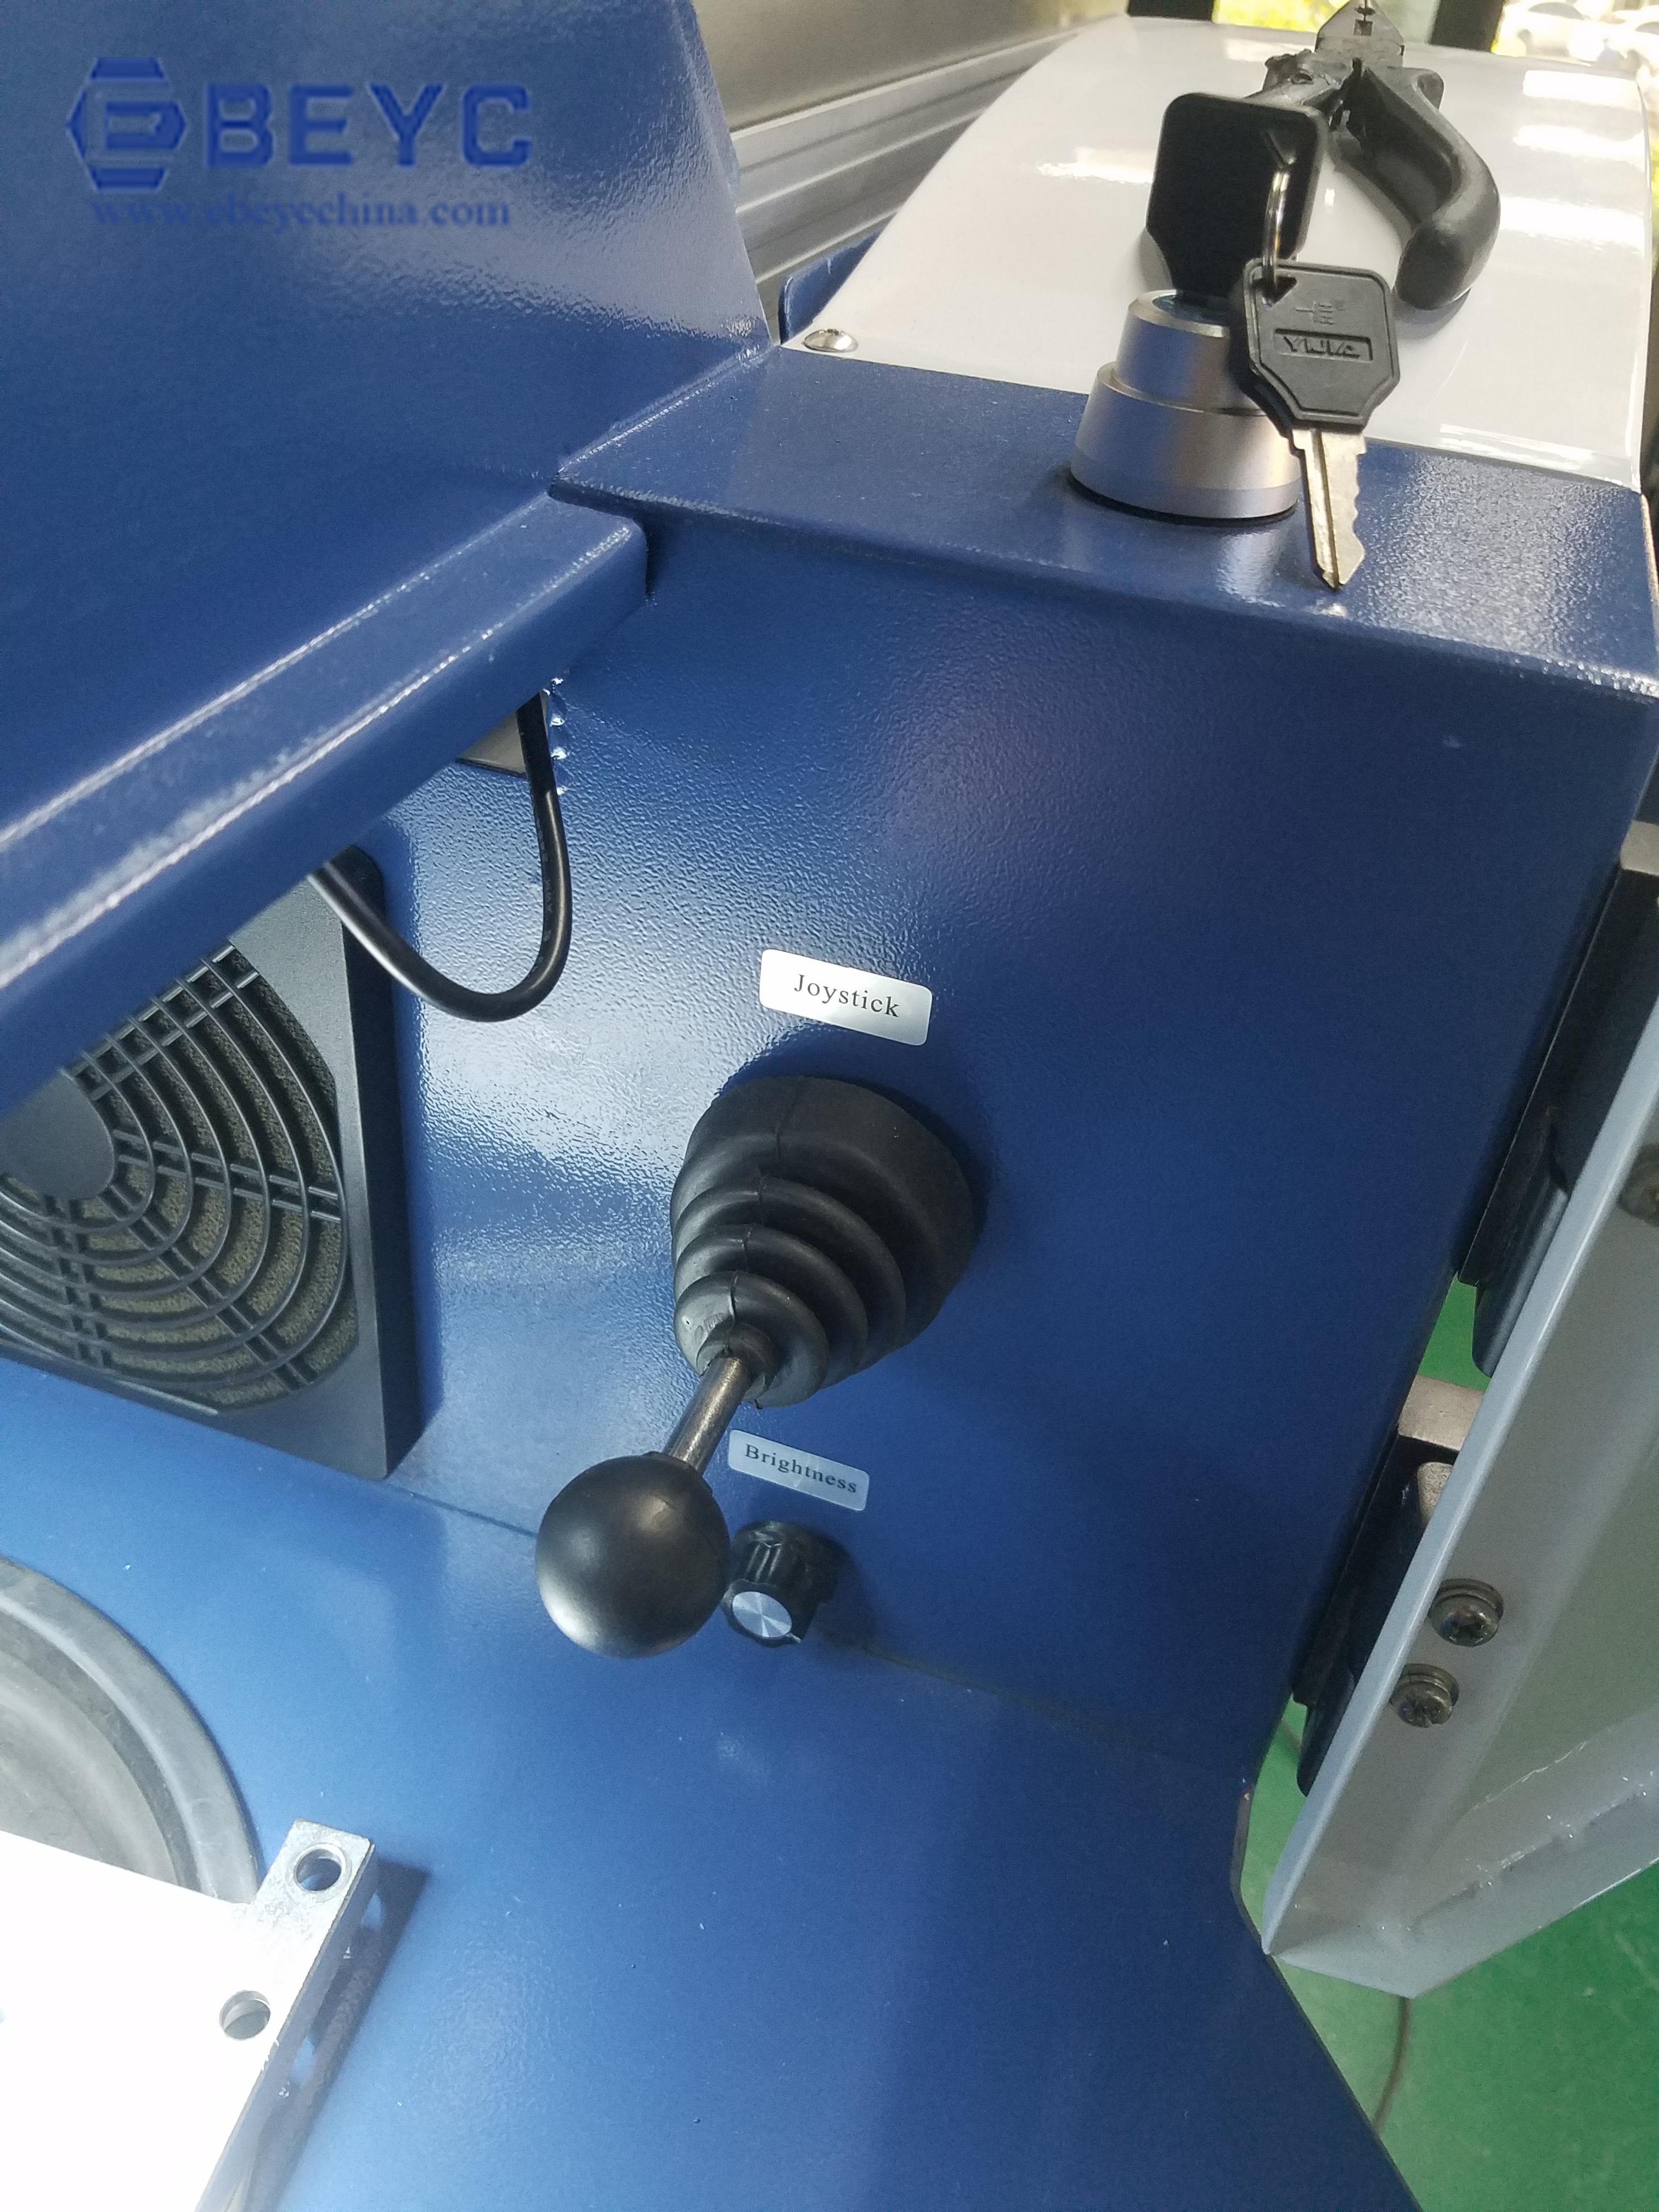 Jewelry Welding Machine